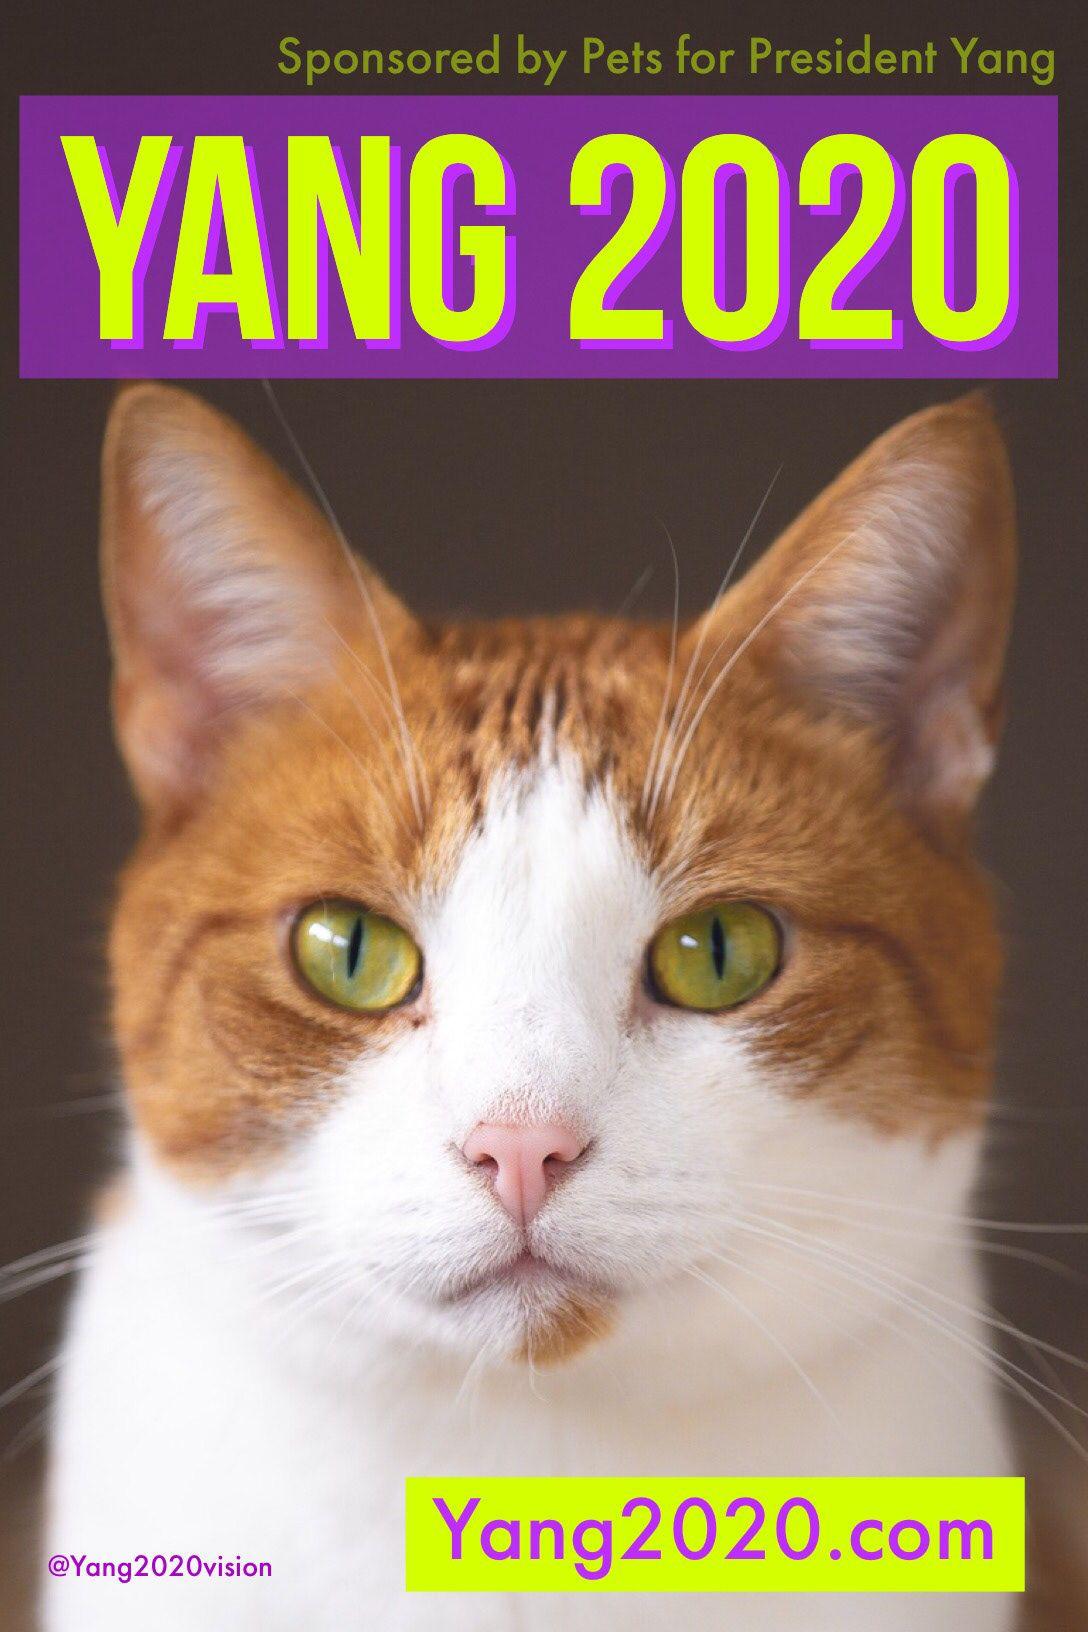 Stoner Gift Ideas 2020 YANG 2020 VISION   Pets for President Yang SUPER CUTE!! SO ADO